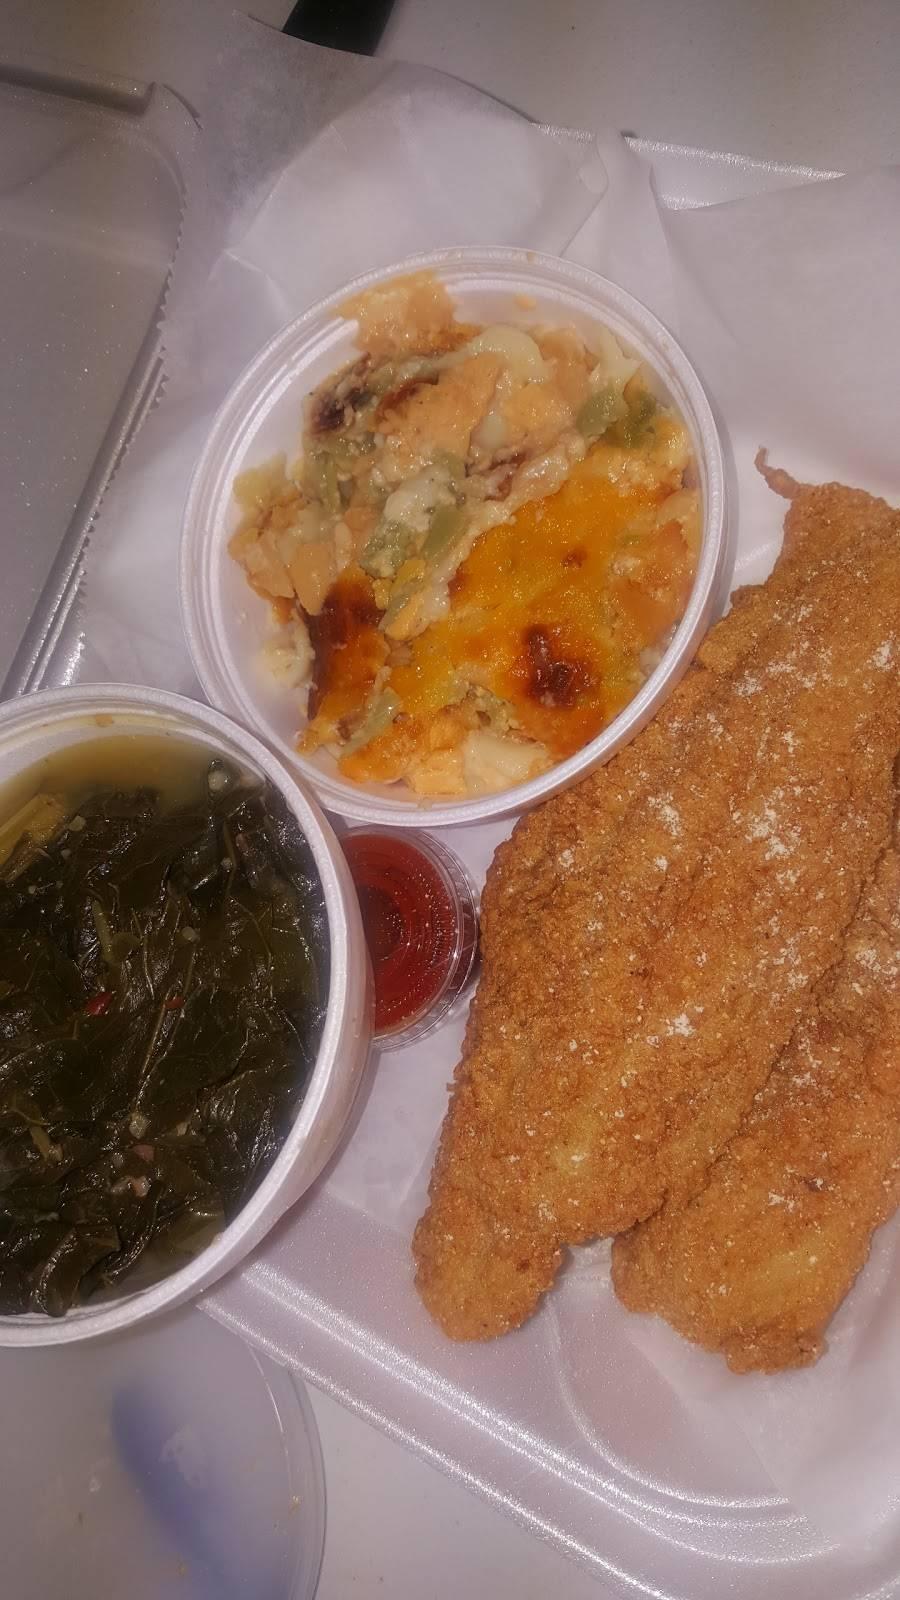 Darrins Fresh Food | restaurant | 1229 E 87th St, Chicago, IL 60619, USA | 7732534722 OR +1 773-253-4722